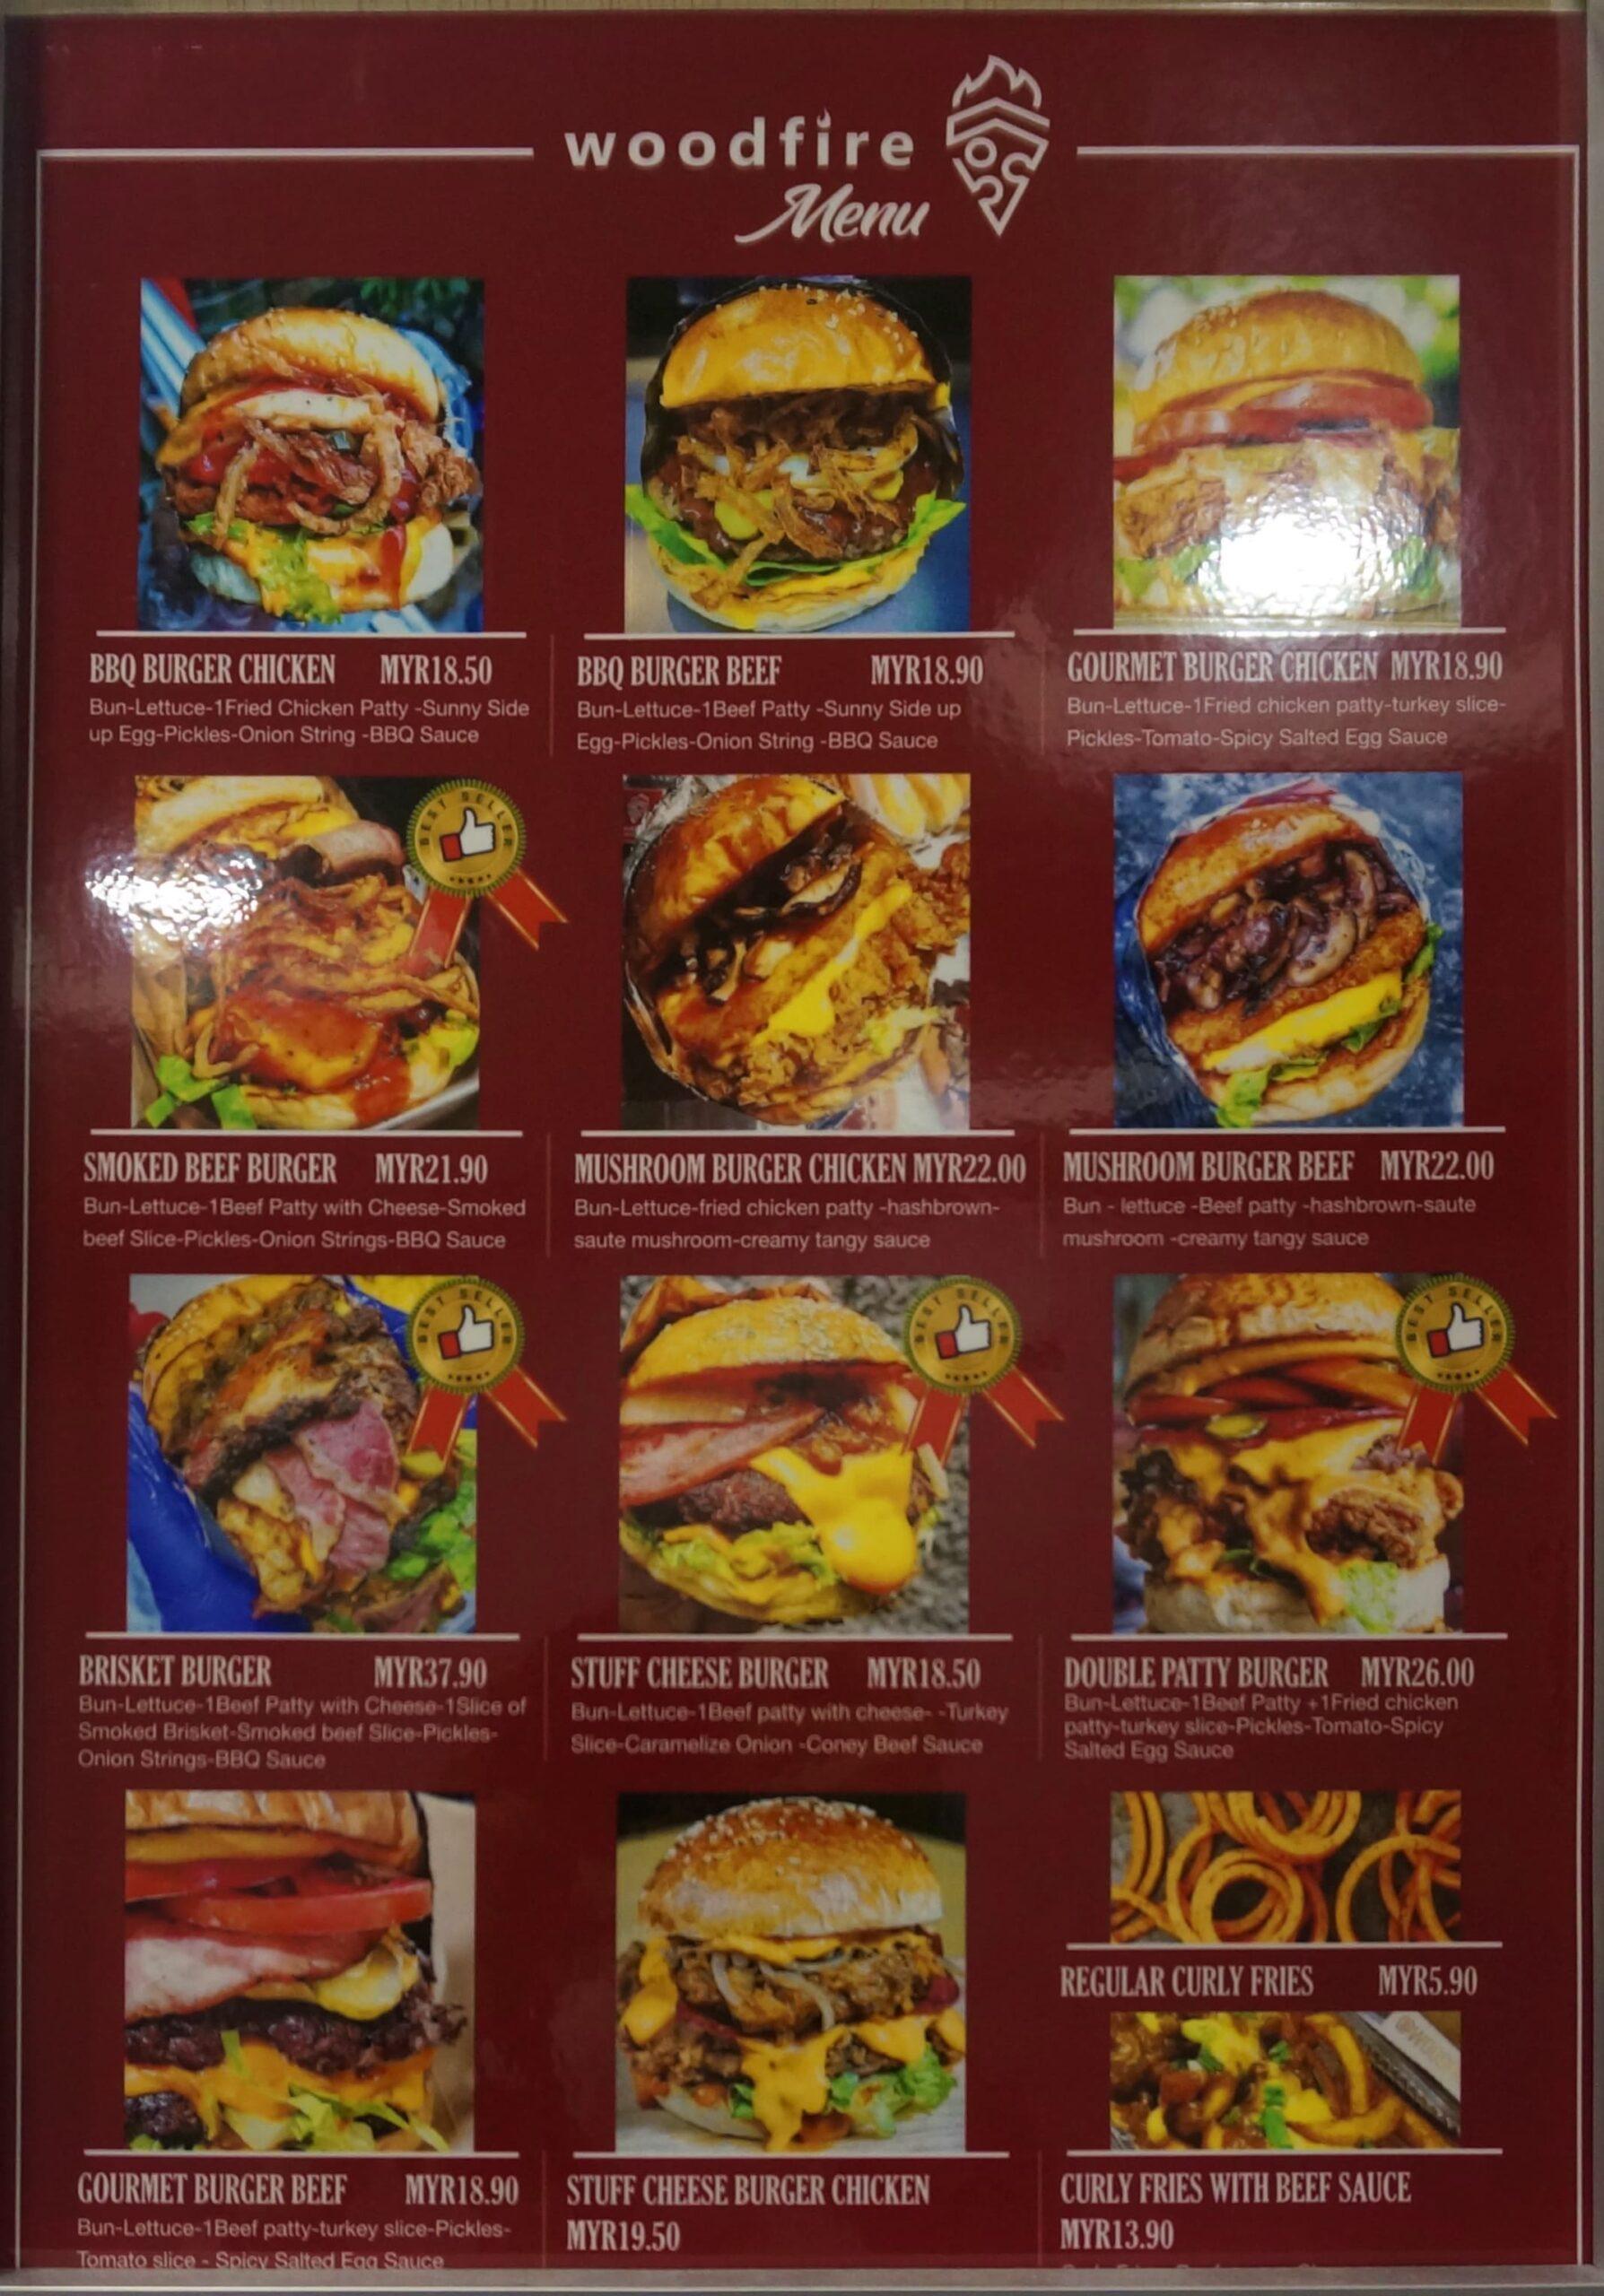 woodfire menu